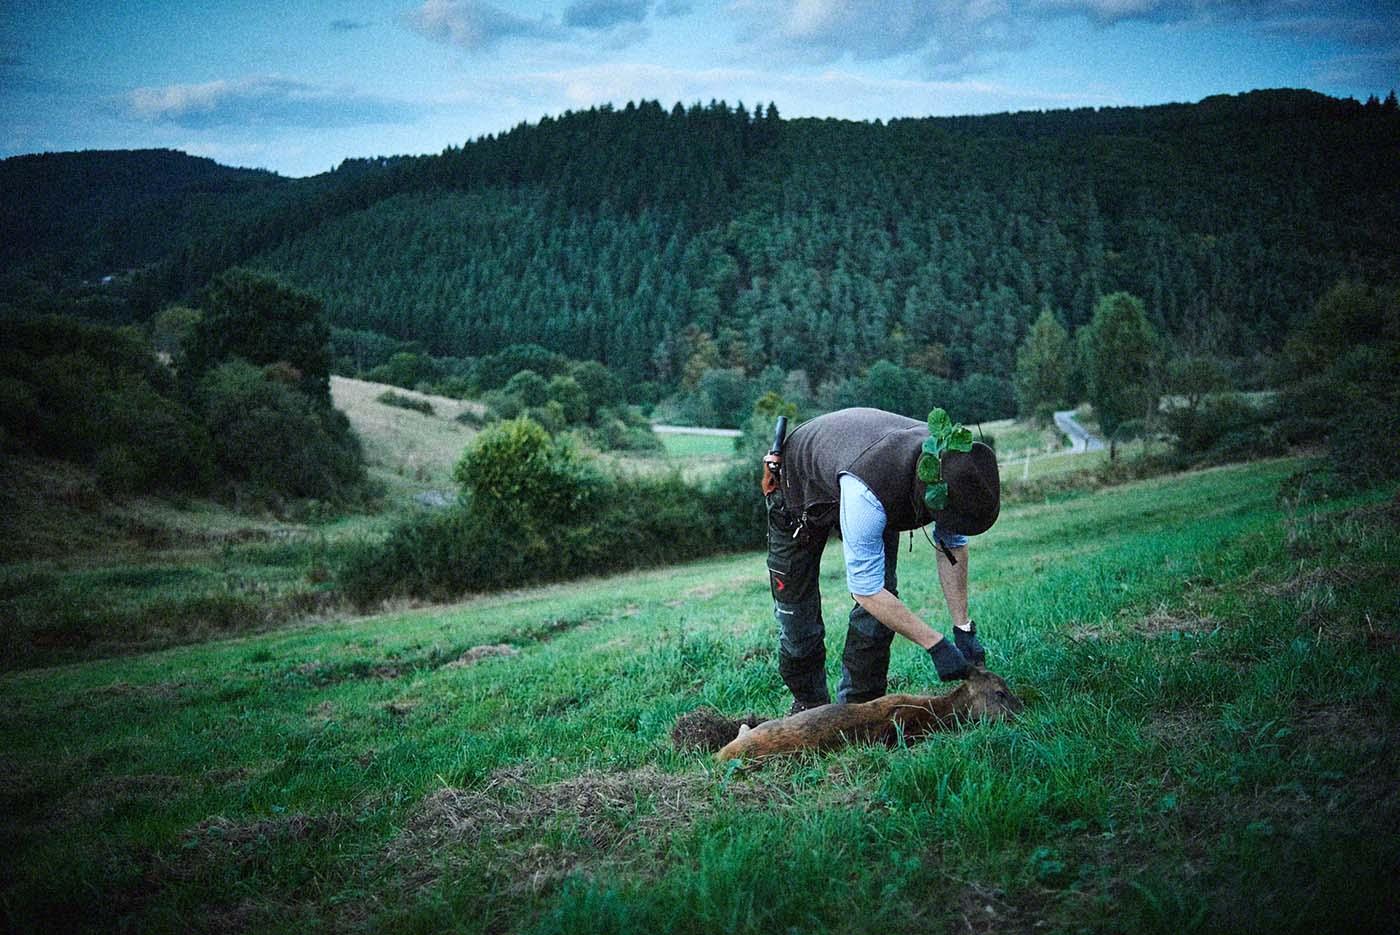 Jäger kontrolliert geschossenes Reh - Jagd-Reportage mit Sternekoch Harald und Maximilian Rüssel Fotos: neon fotografie